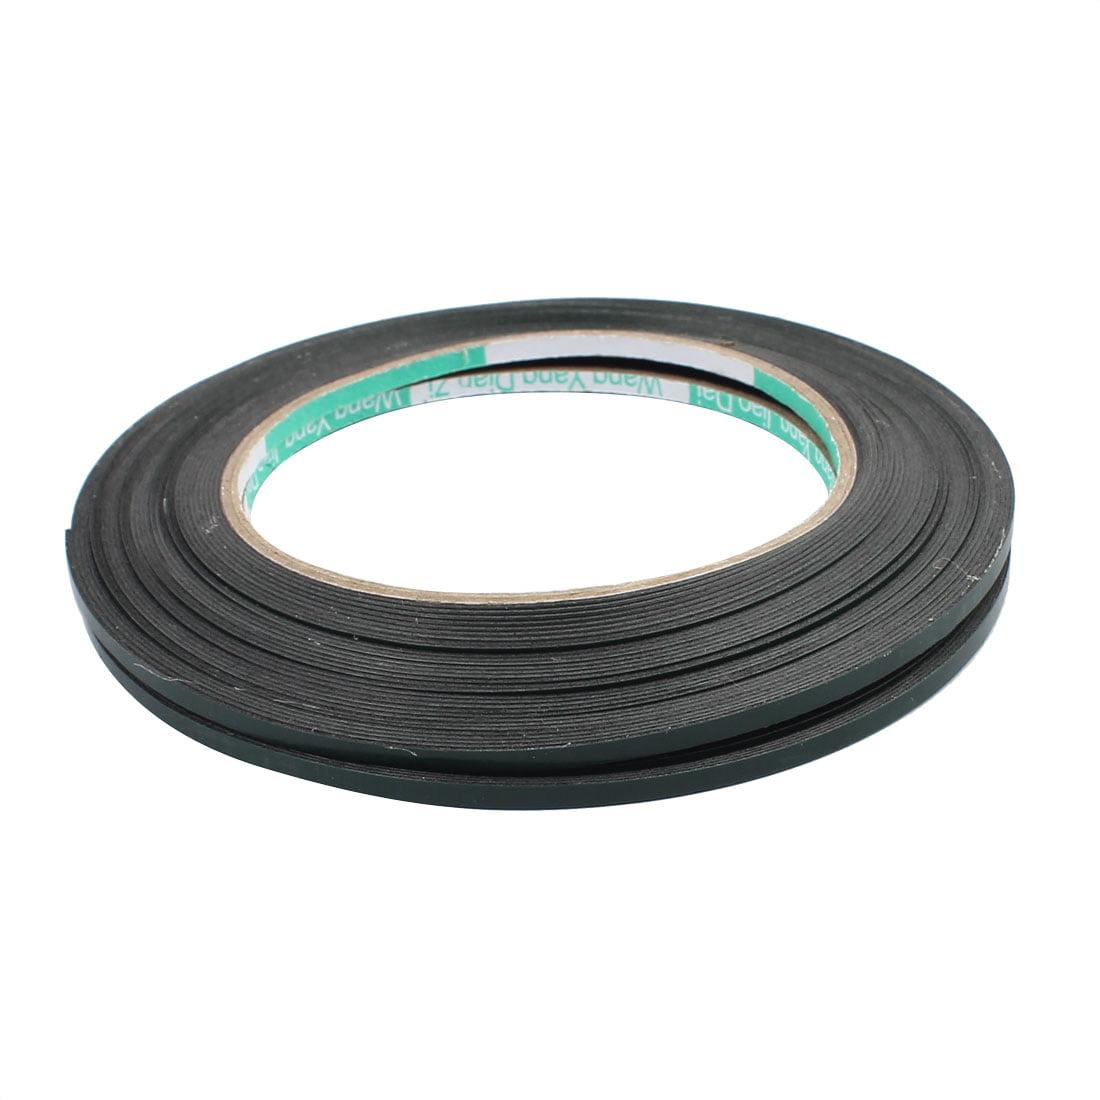 2pcs 10M x 3mm x 0.5mm Dual-side Adhesive Shockproof Sponge Foam Tape Green - image 2 de 3